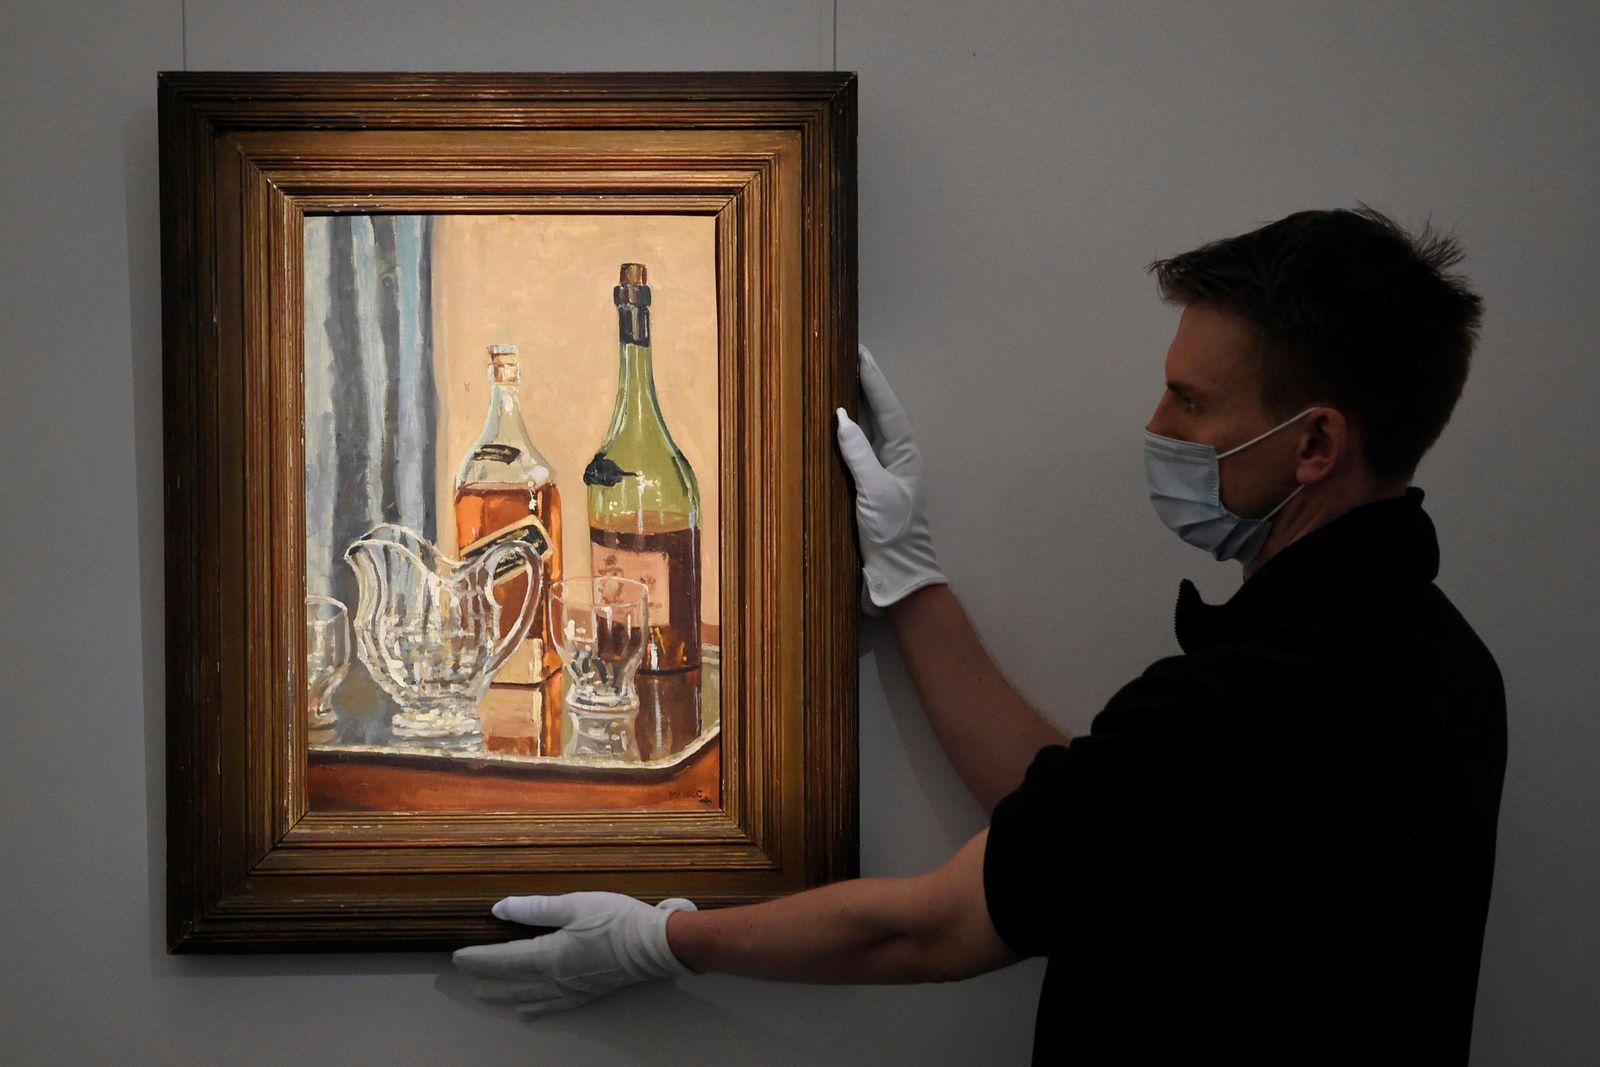 FILES-BRITAIN-ART-HISTORY-AUCTION